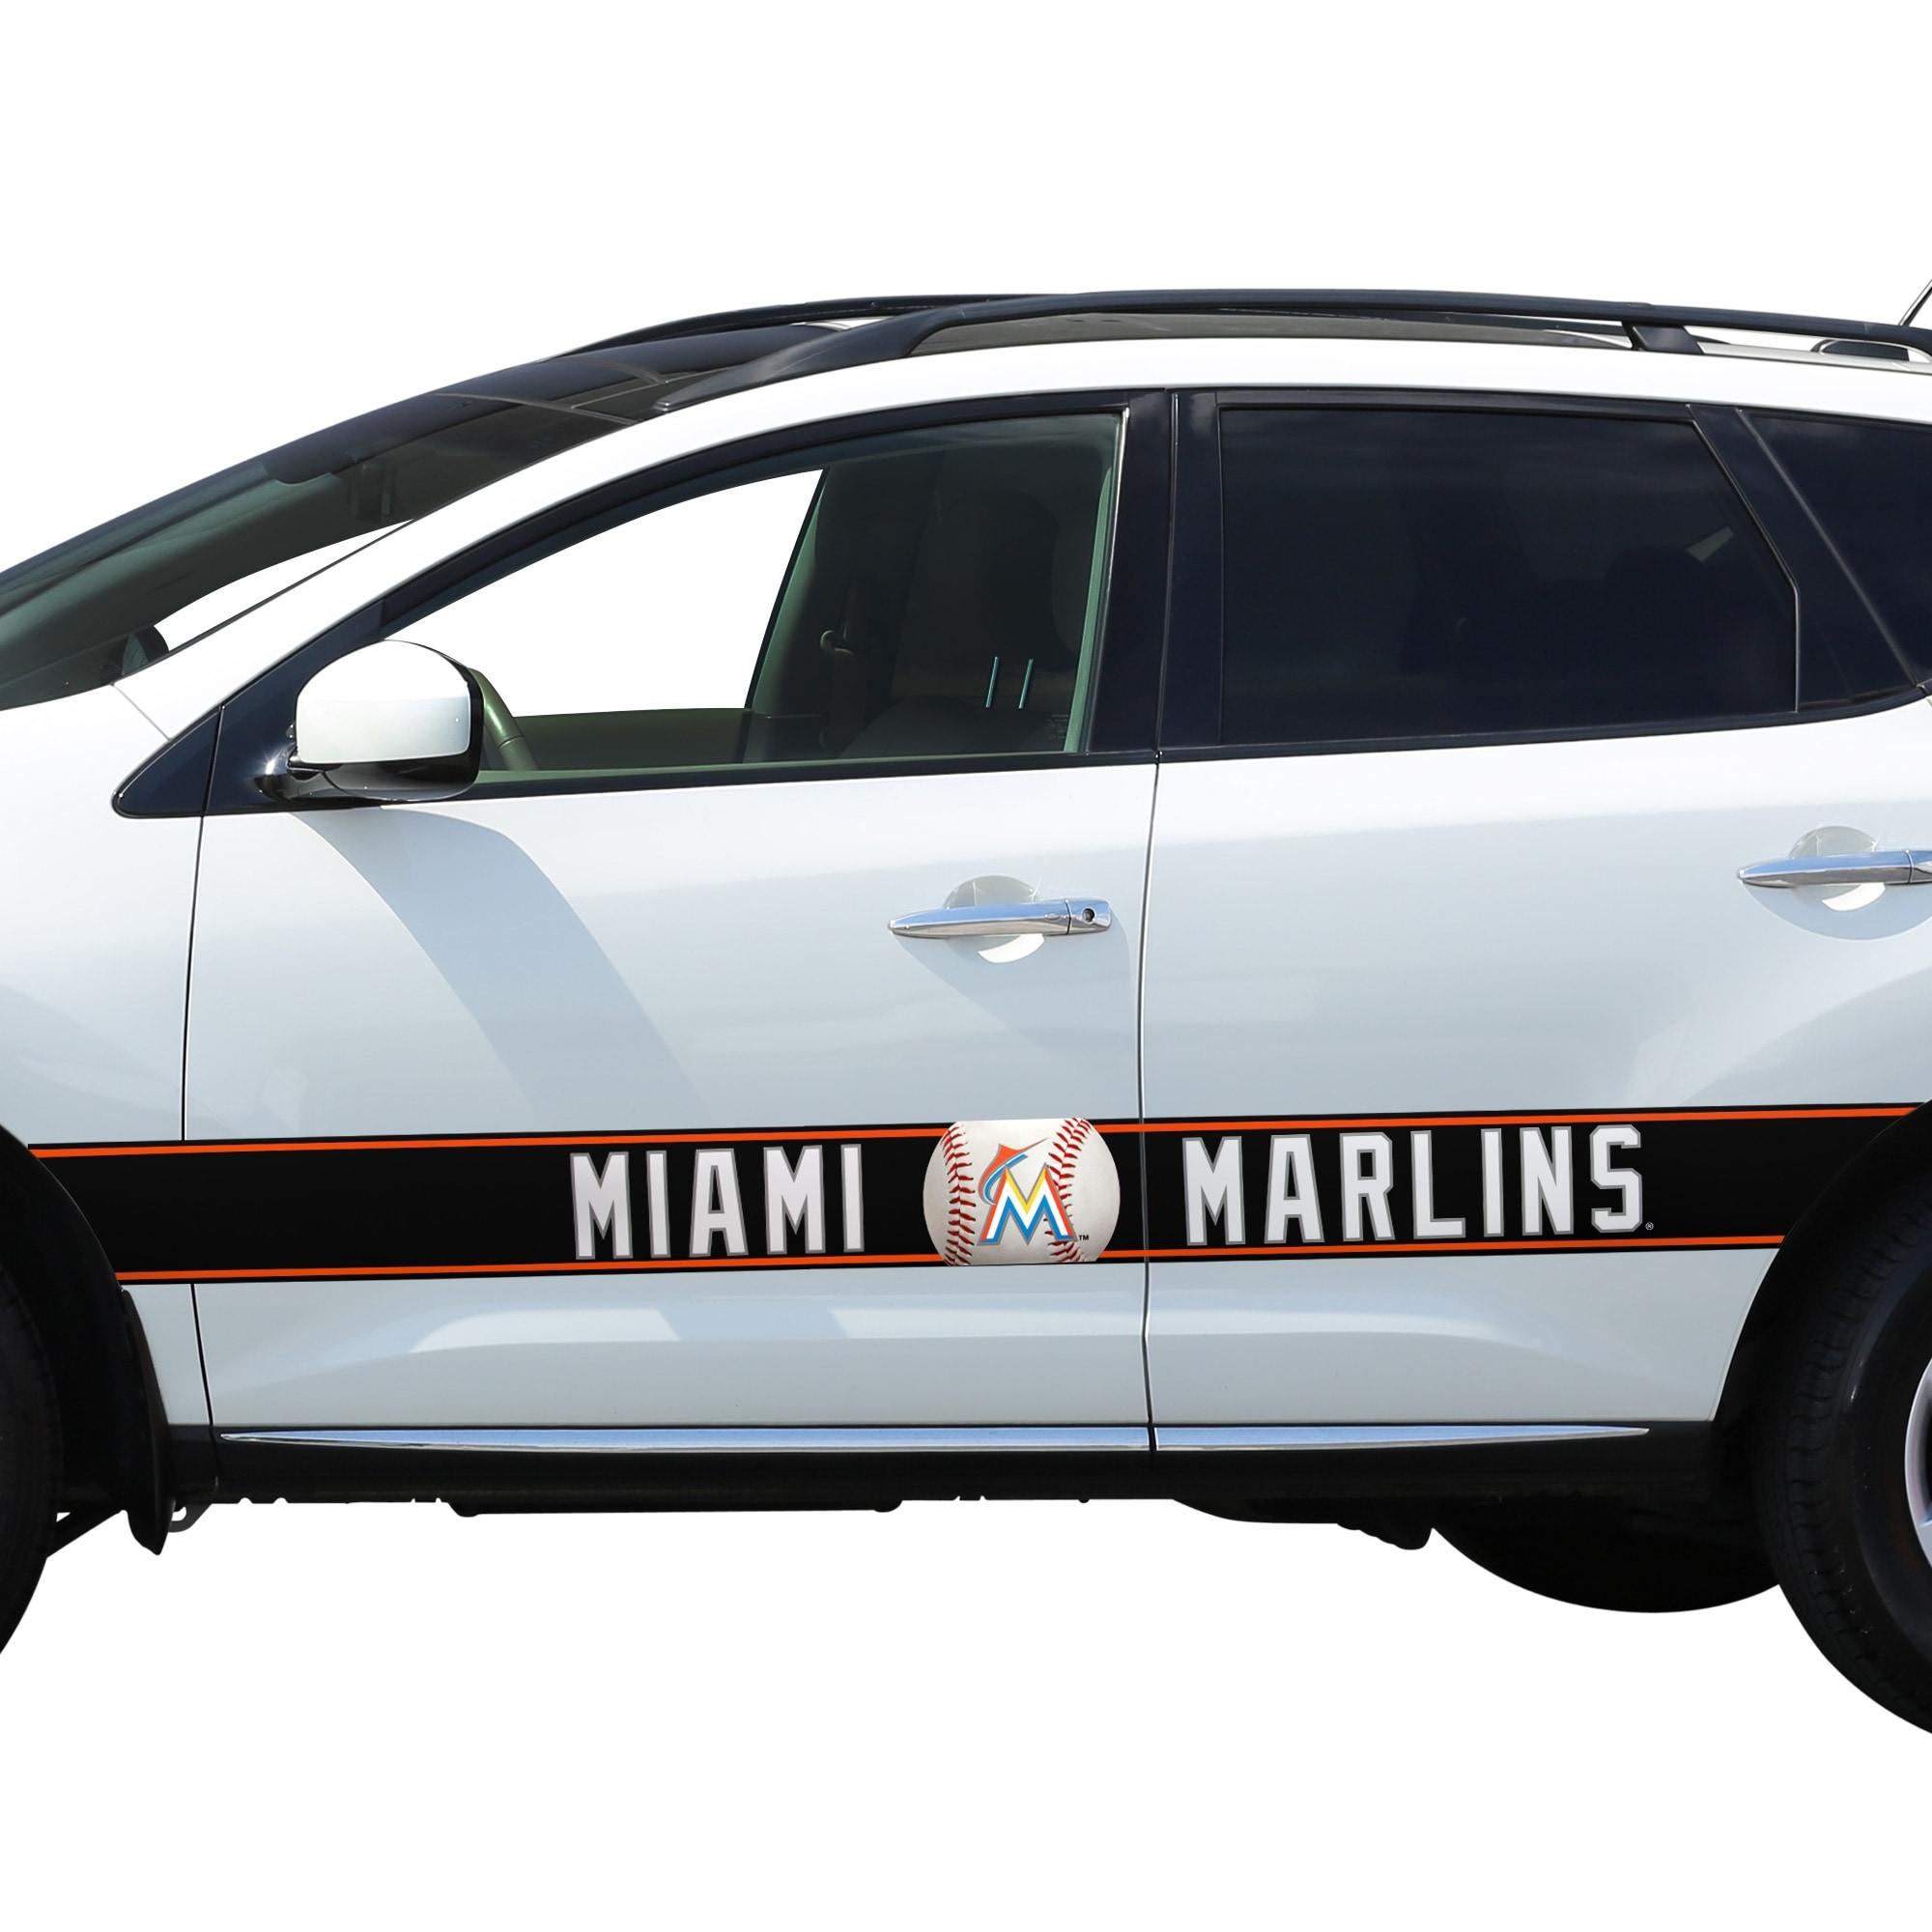 Miami Marlins Team Ball Racing Stripe Car Decals